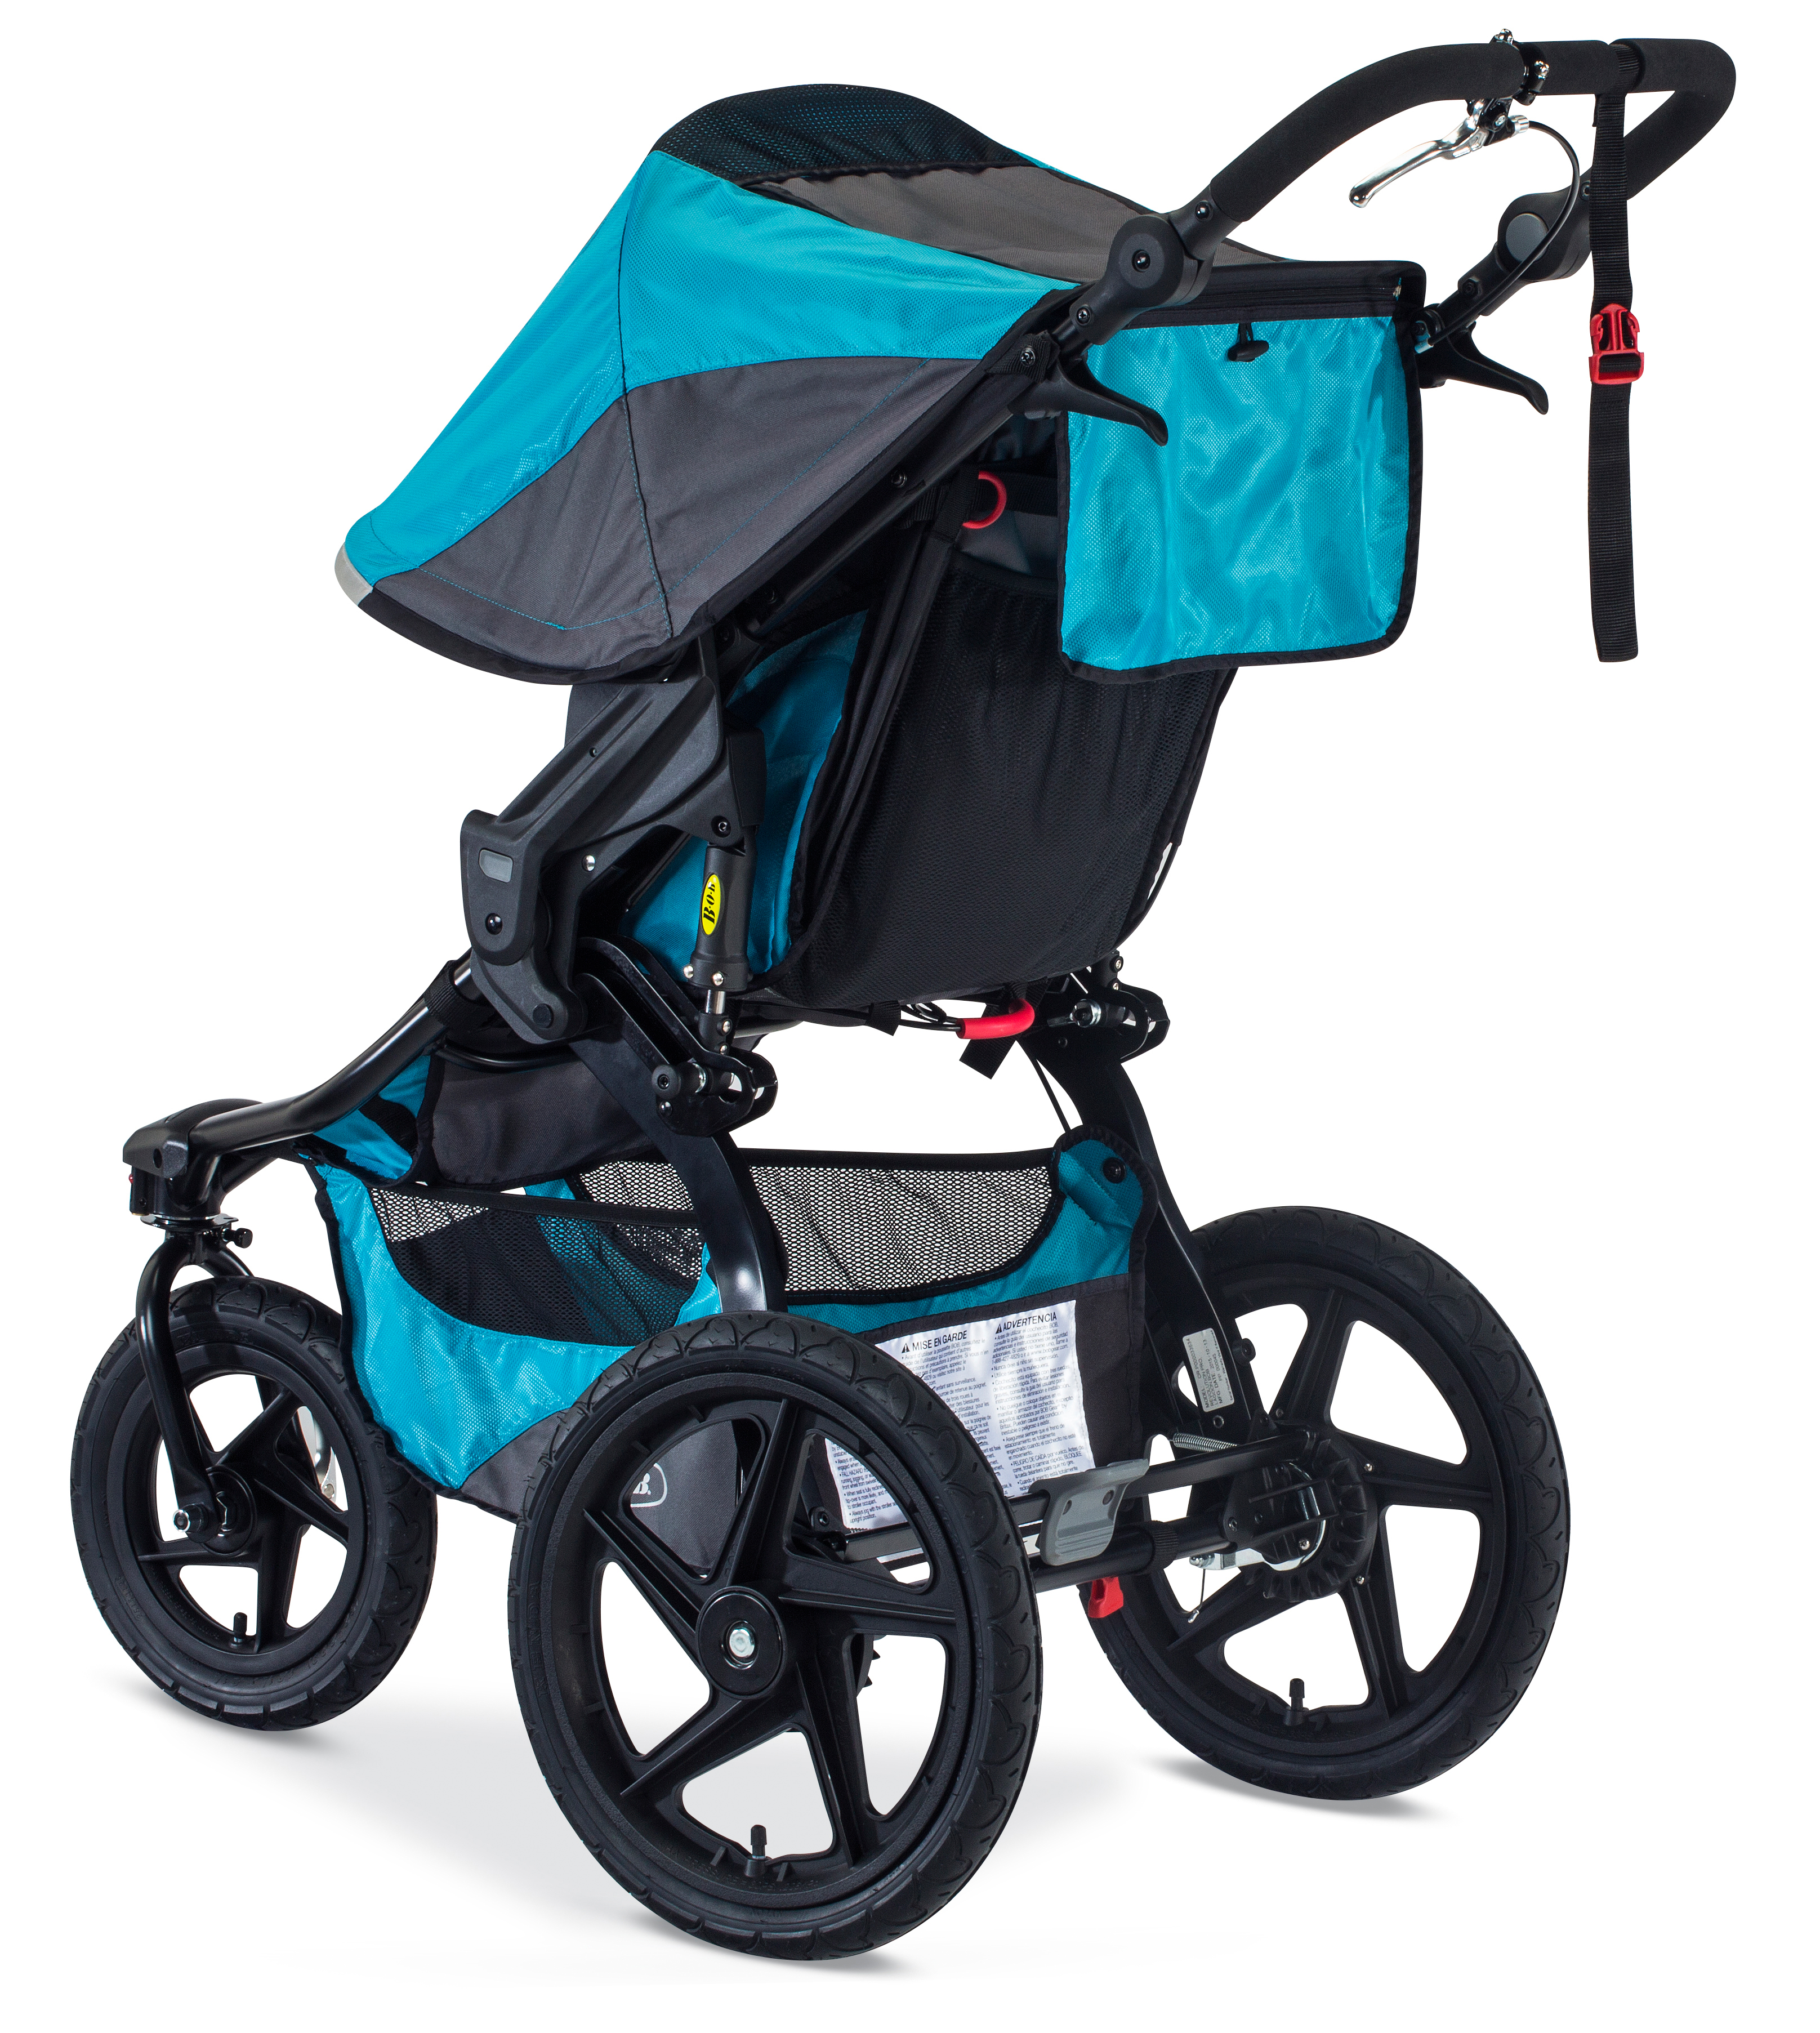 BOB Revolution Pro Single Stroller 2016 - Infants to